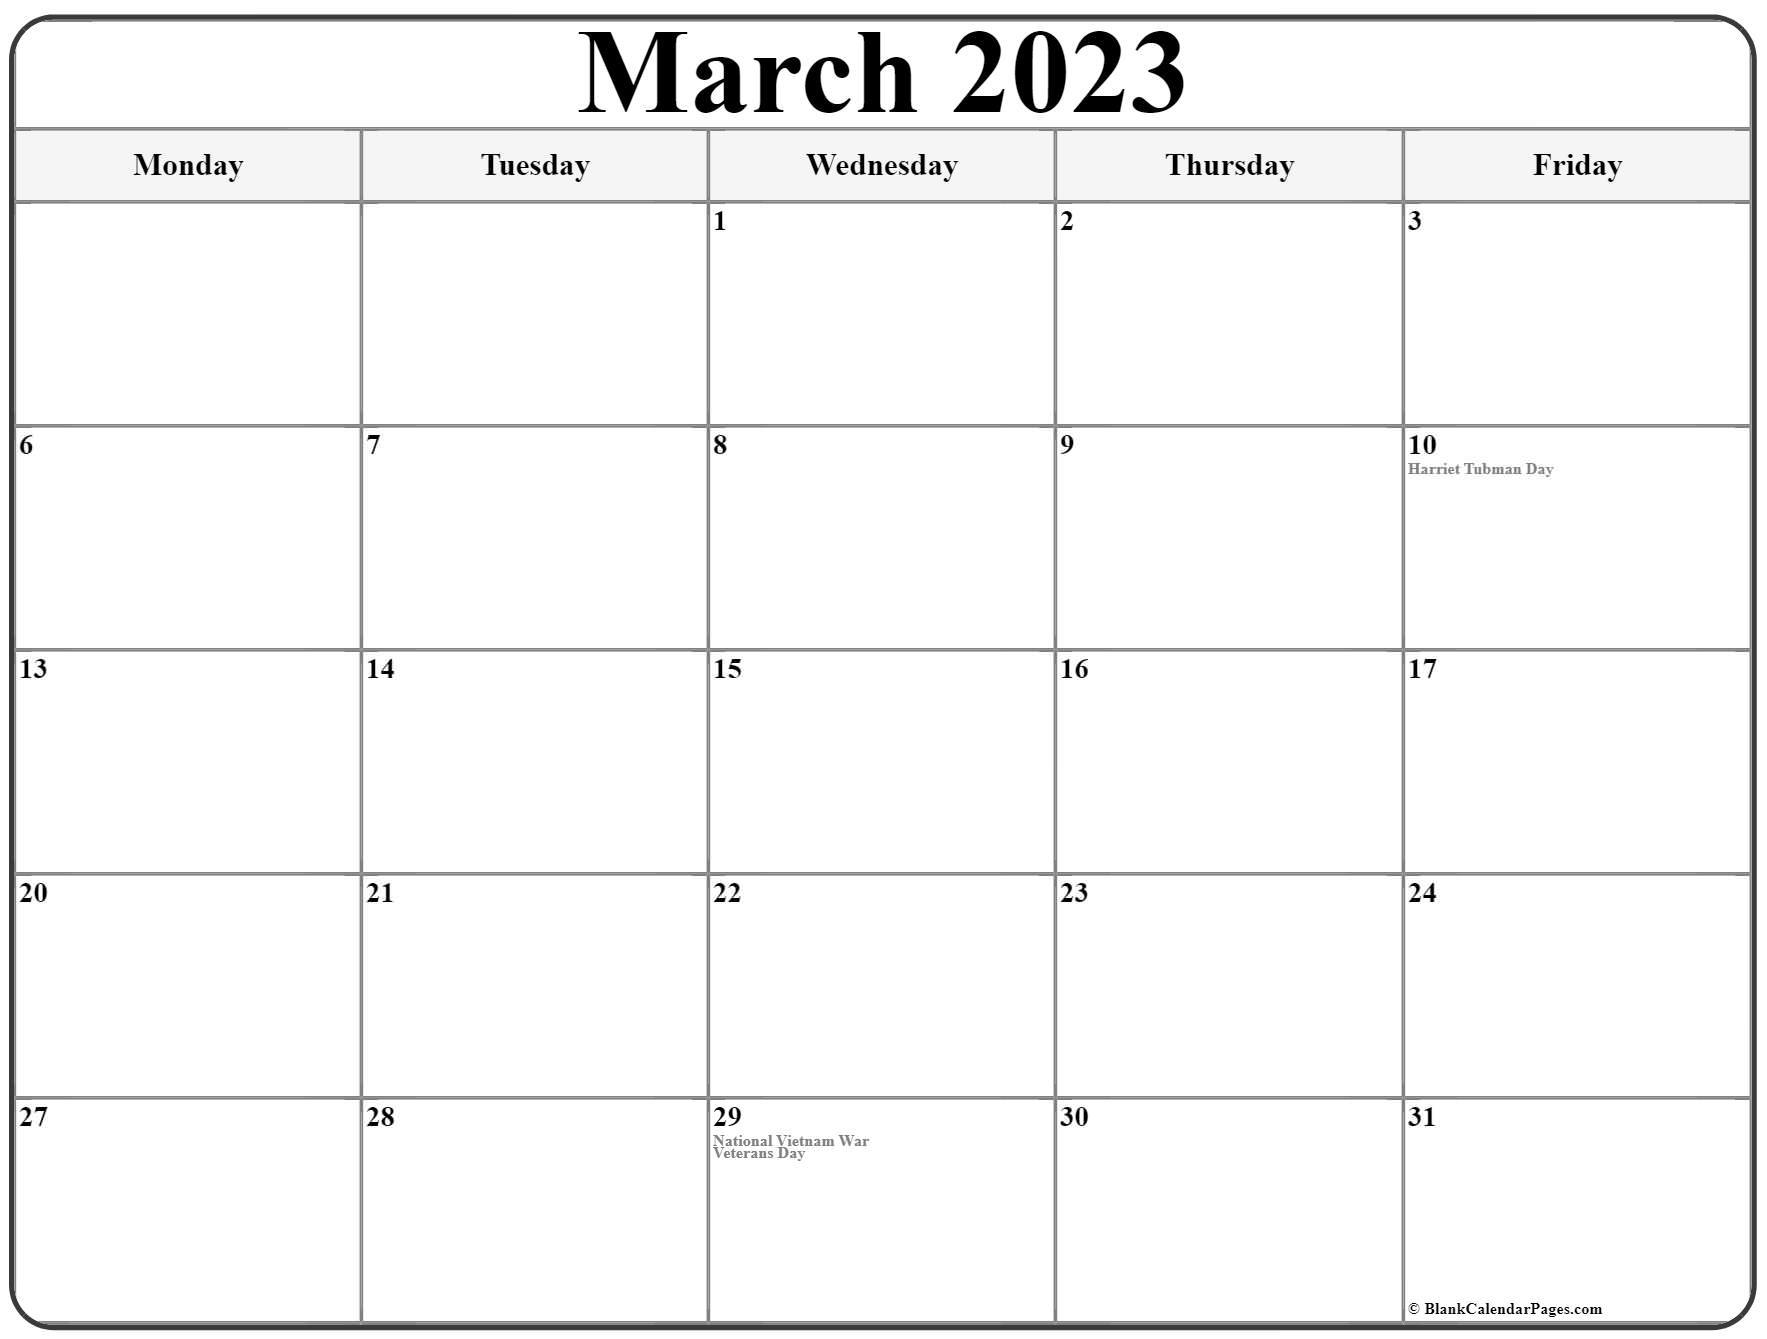 March 2023 Monday Calendar | Monday To Sunday